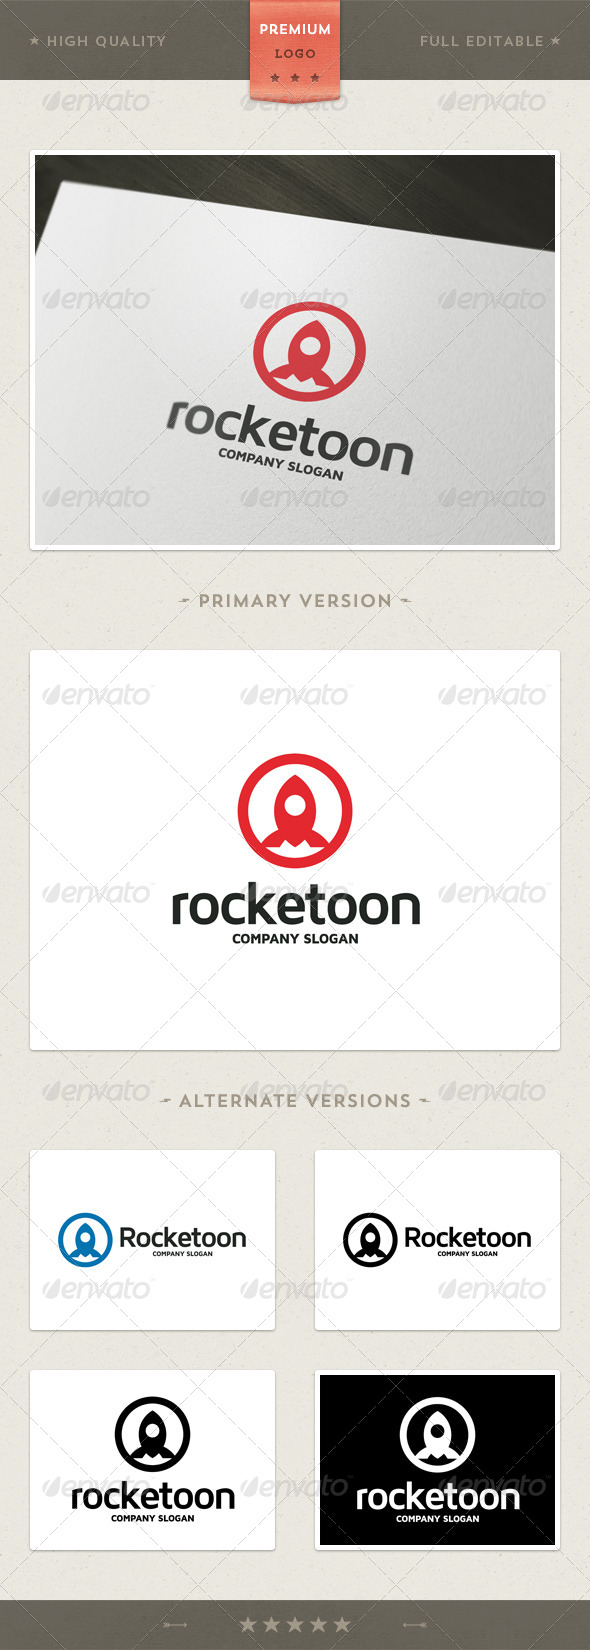 Rocketoon - Rocket Symbol Logo Template